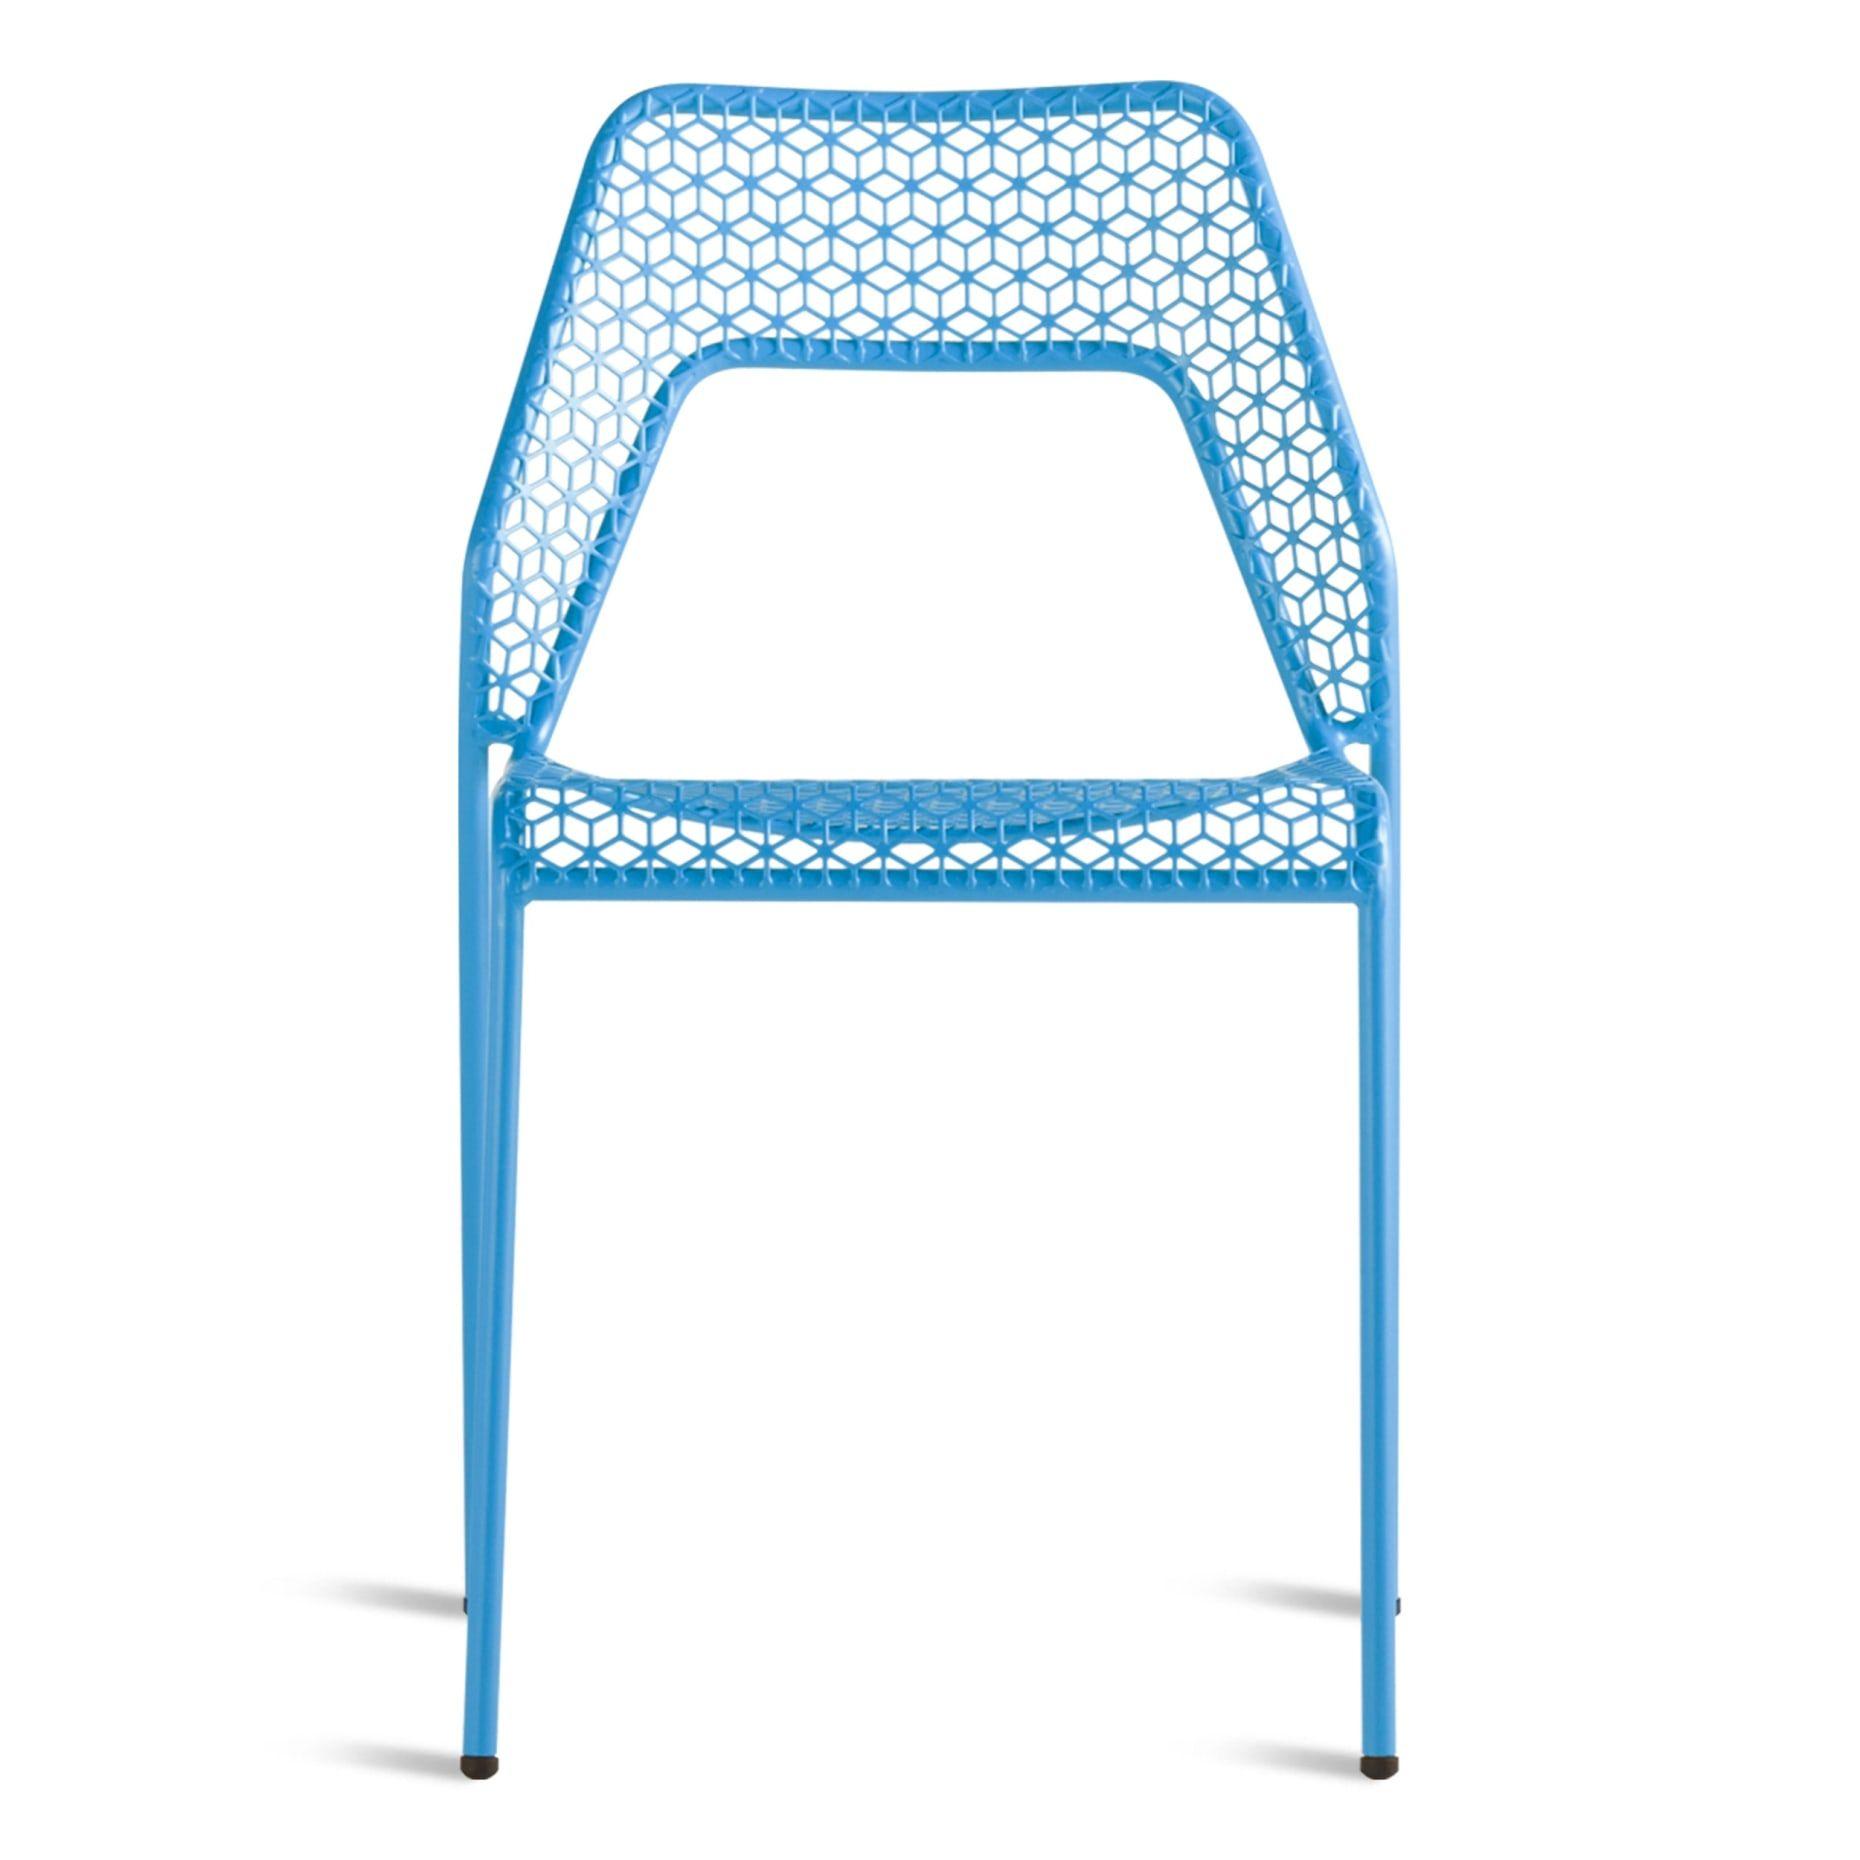 Hot Mesh Chair Green Mesh Chair Metal Patio Chairs Modern Outdoor Furniture